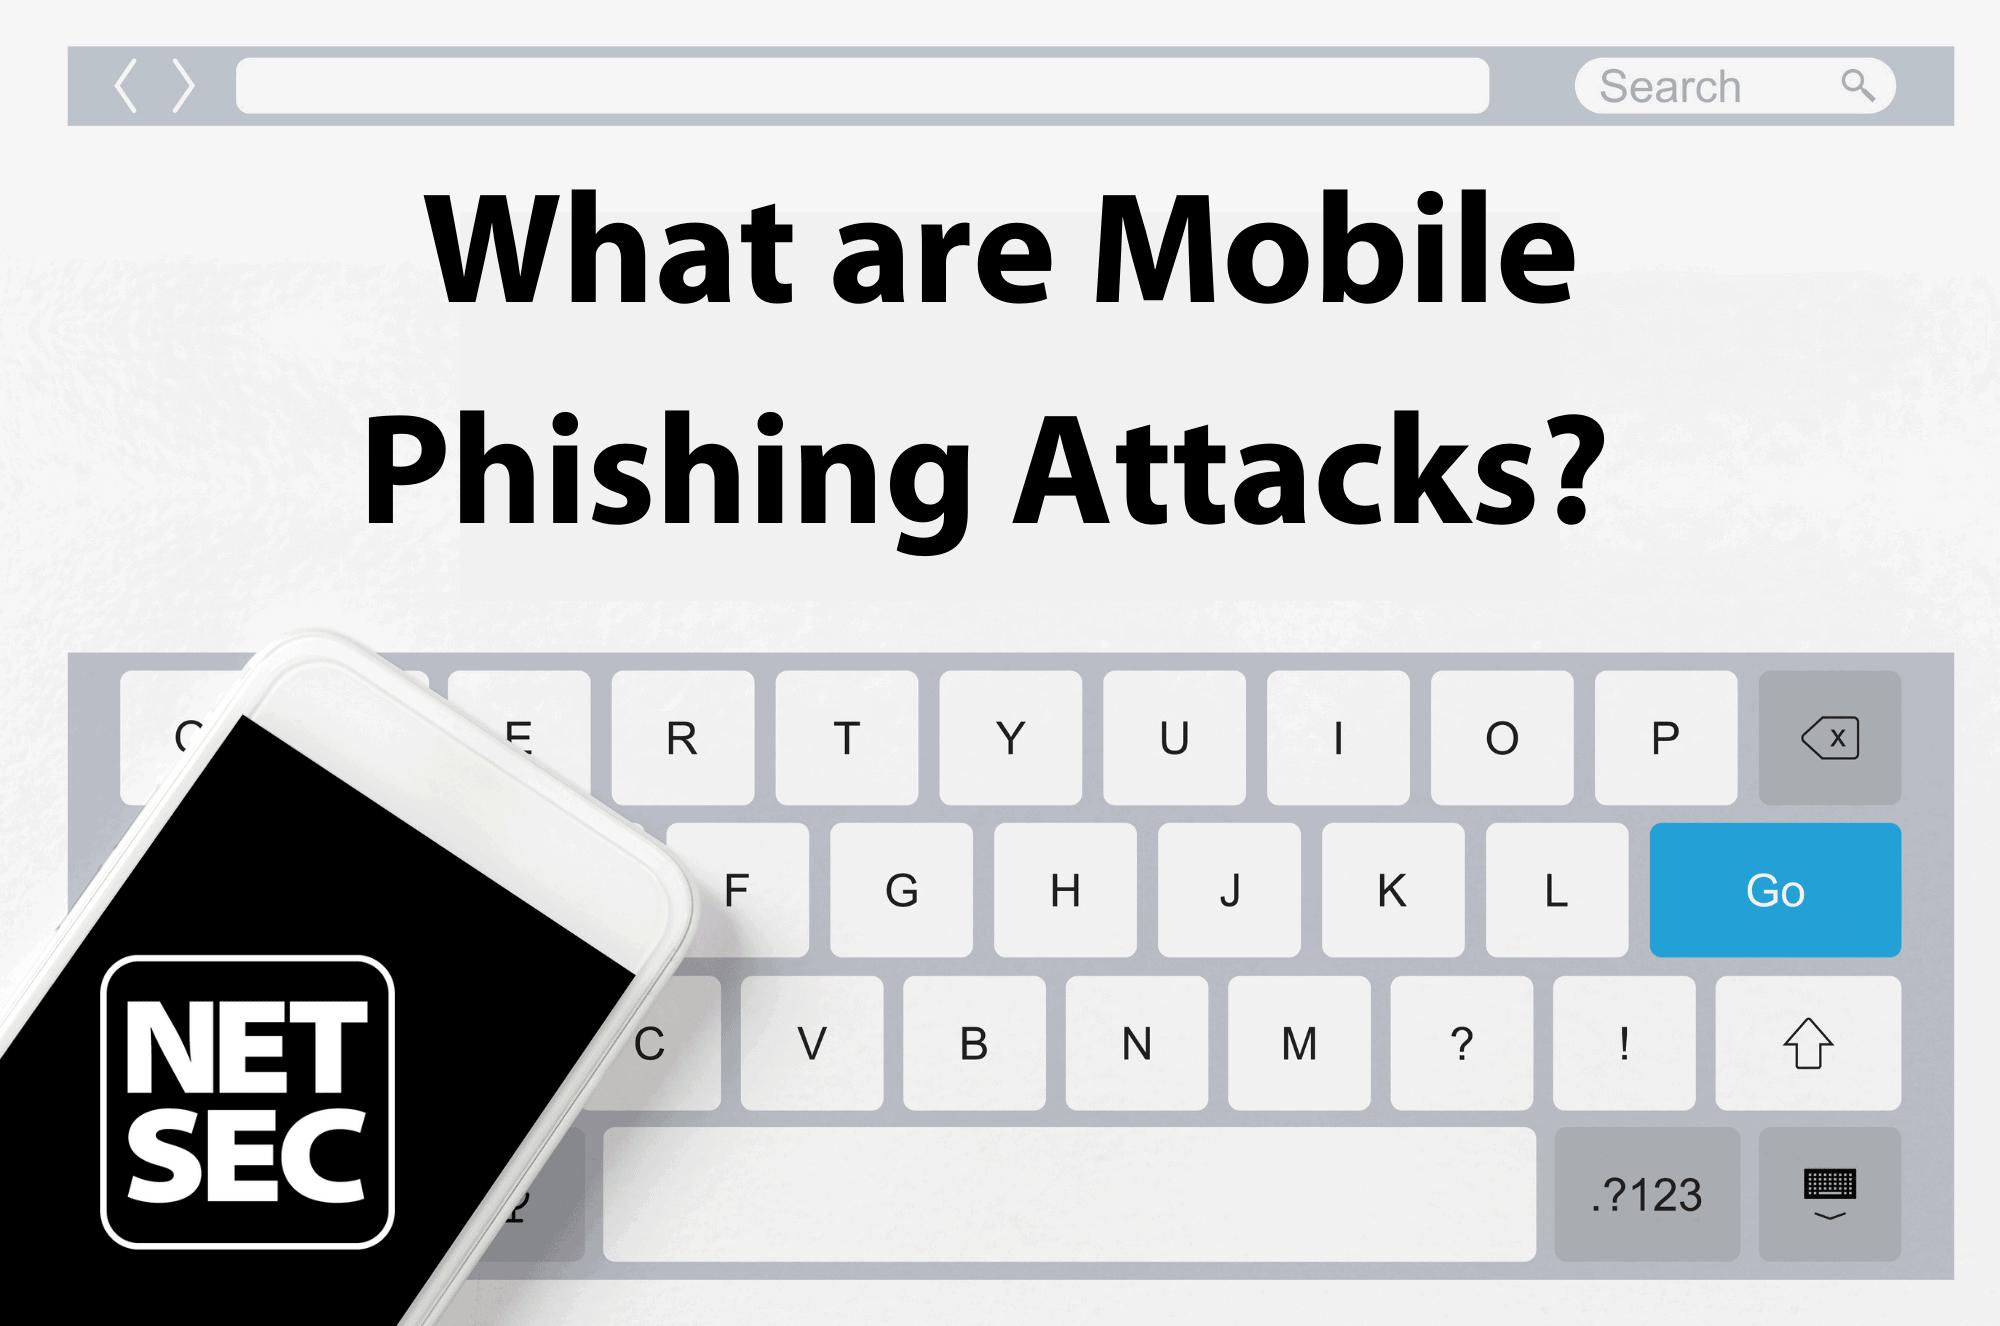 Mobile Phishing Attacks